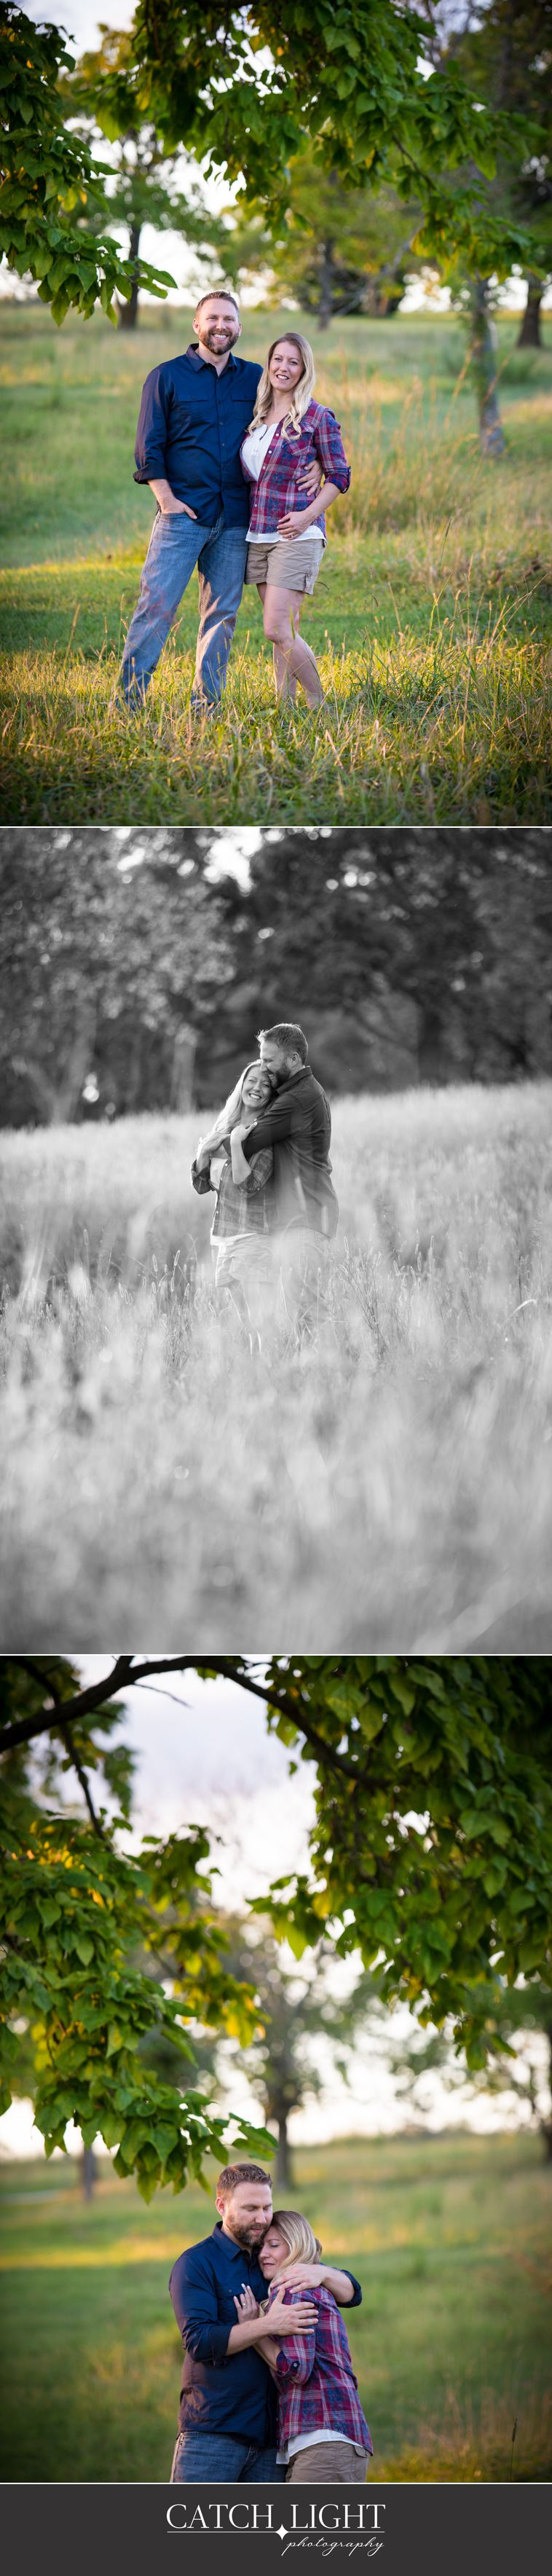 kansas-city-engagement-photography-5